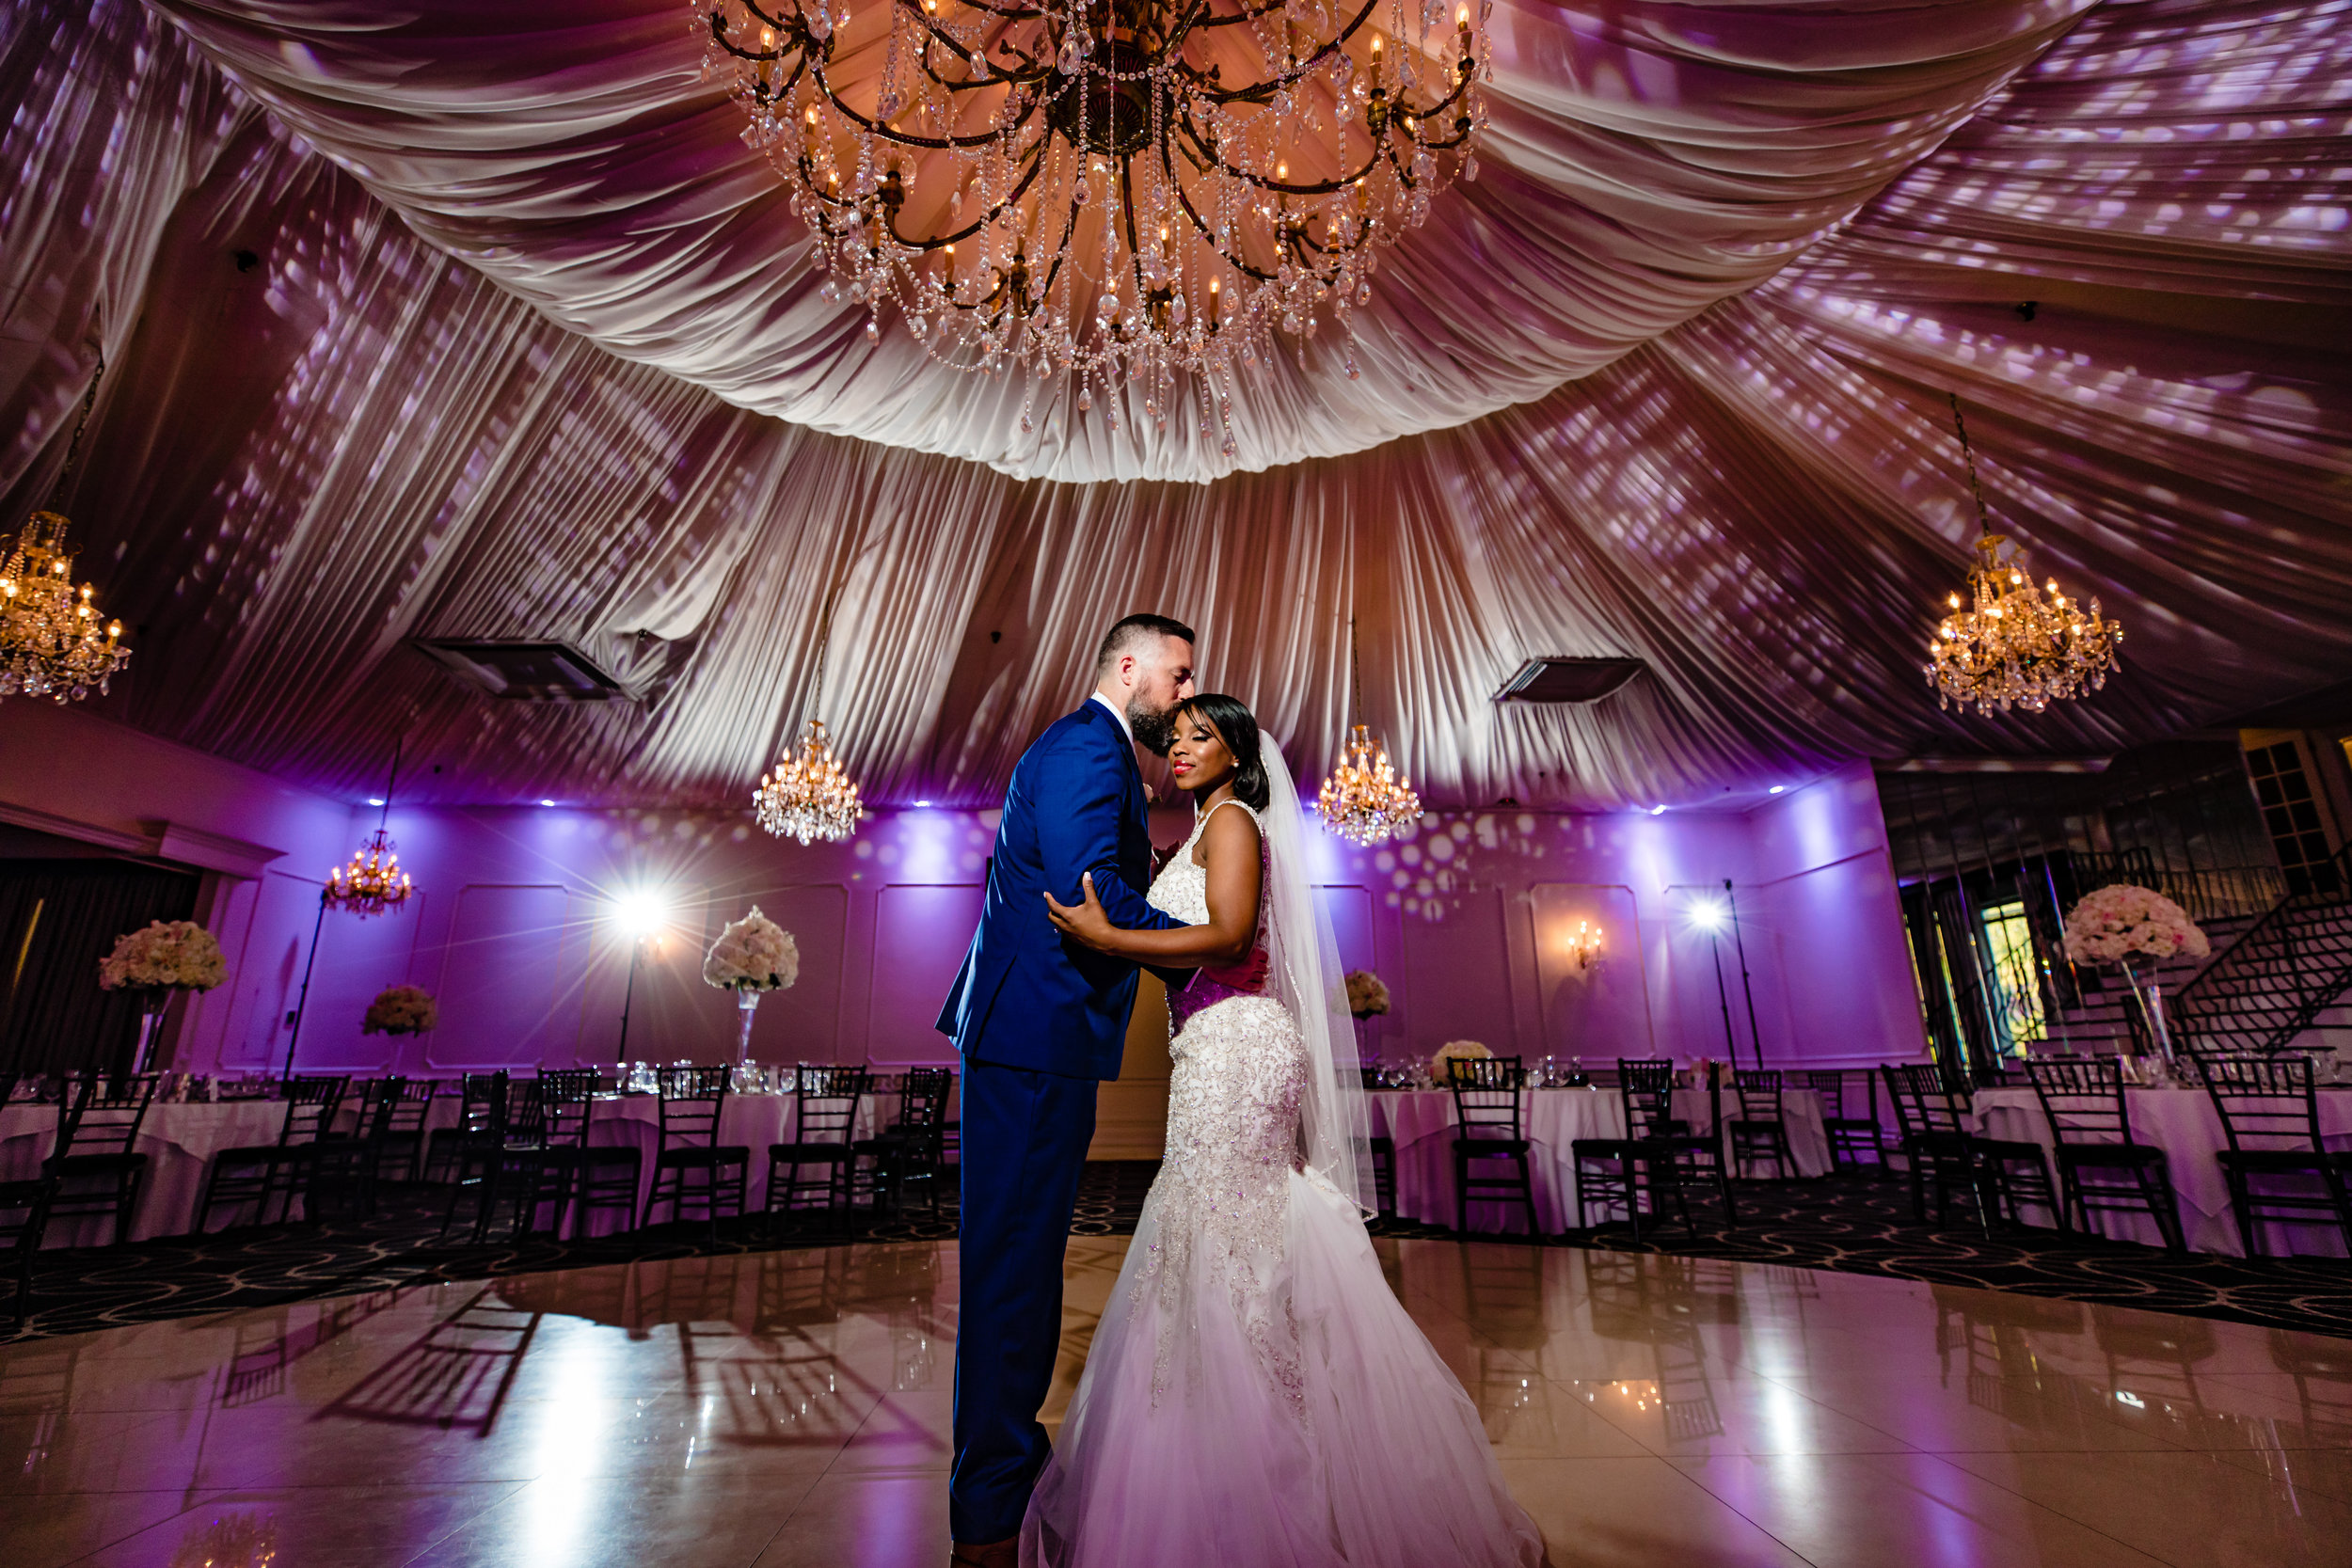 epic ballroom first wedding dance gramercy lakeside manor